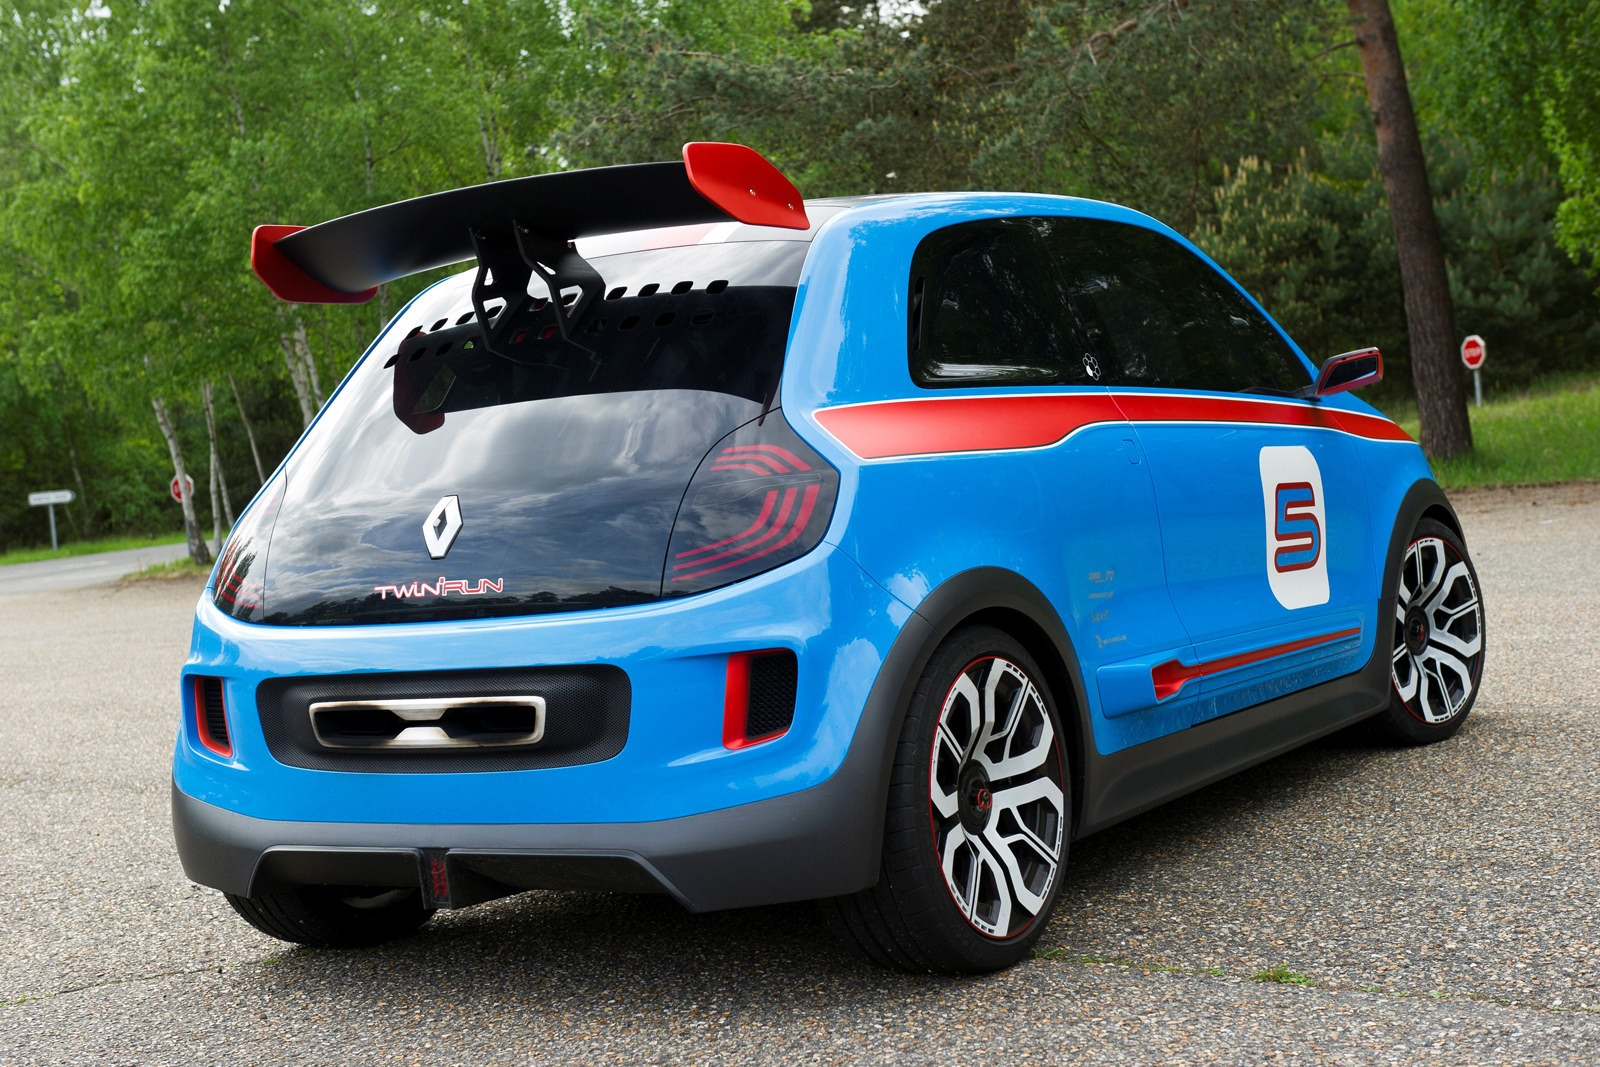 Renault-TwinRun-Concept-47[2]